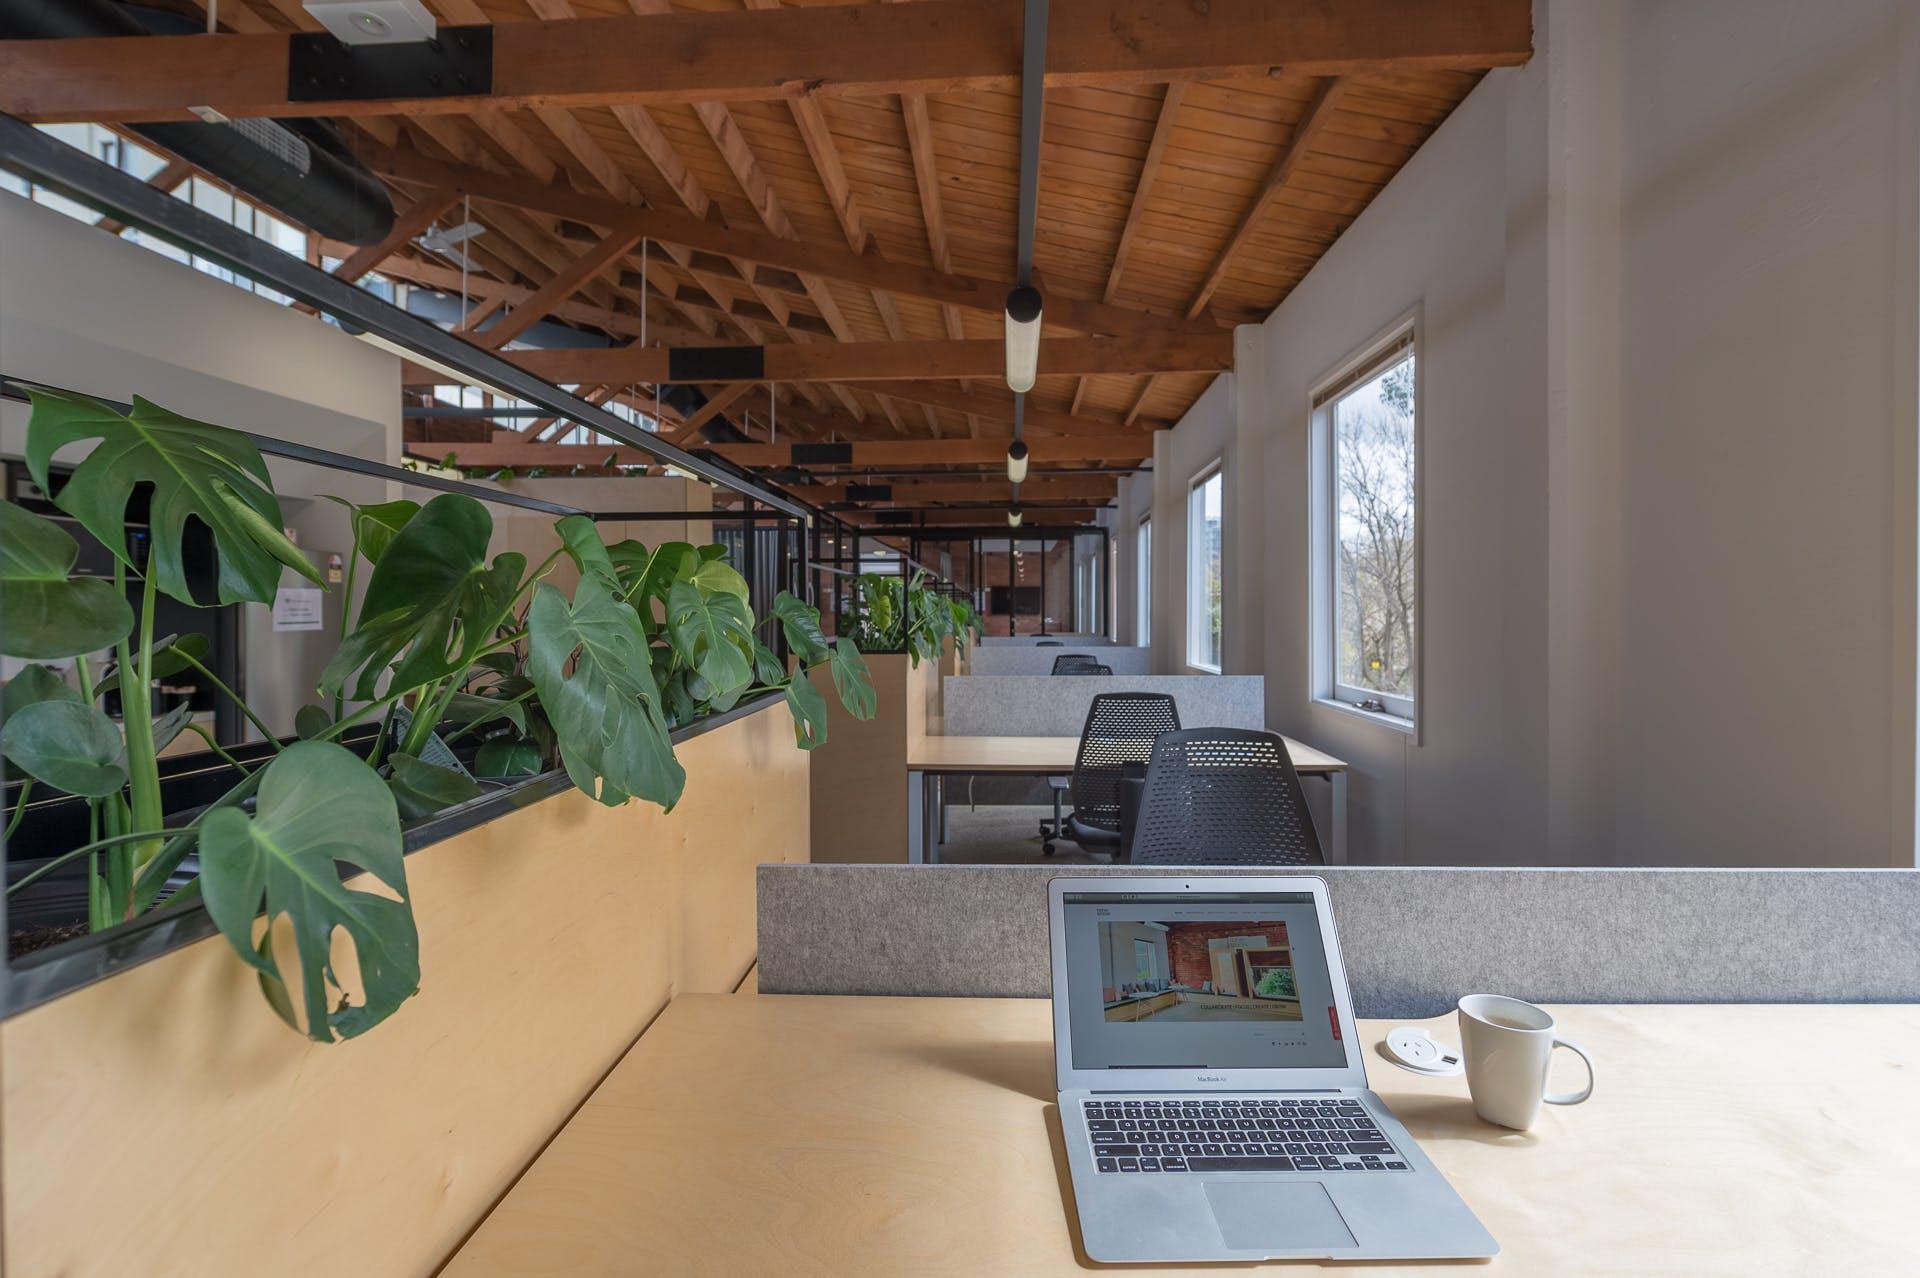 Flex membership (3 Days Per Week), dedicated desk at Higher Spaces, image 1